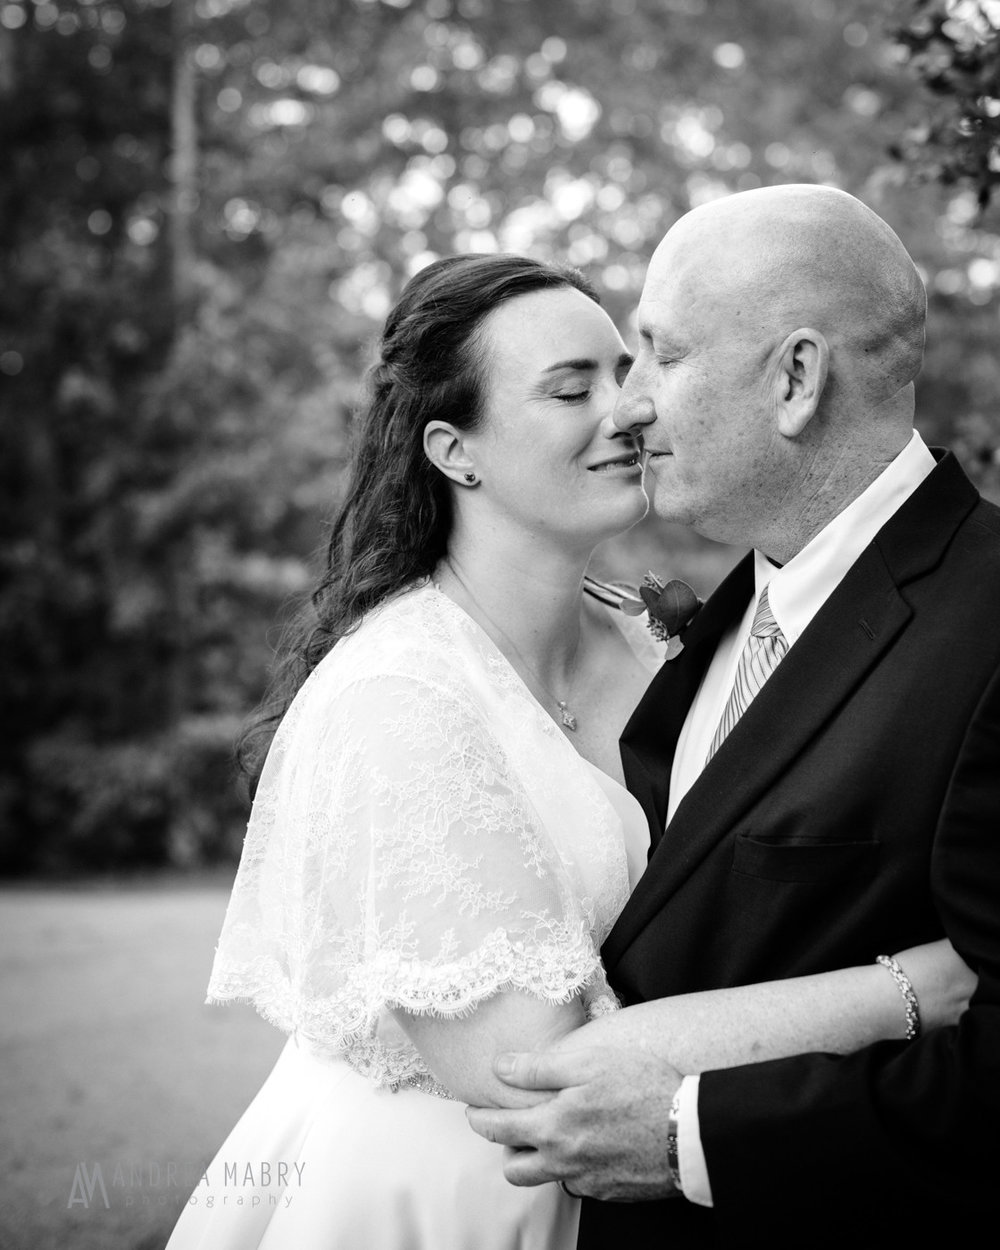 scott-wed-blog-mabry-053-2250.jpg